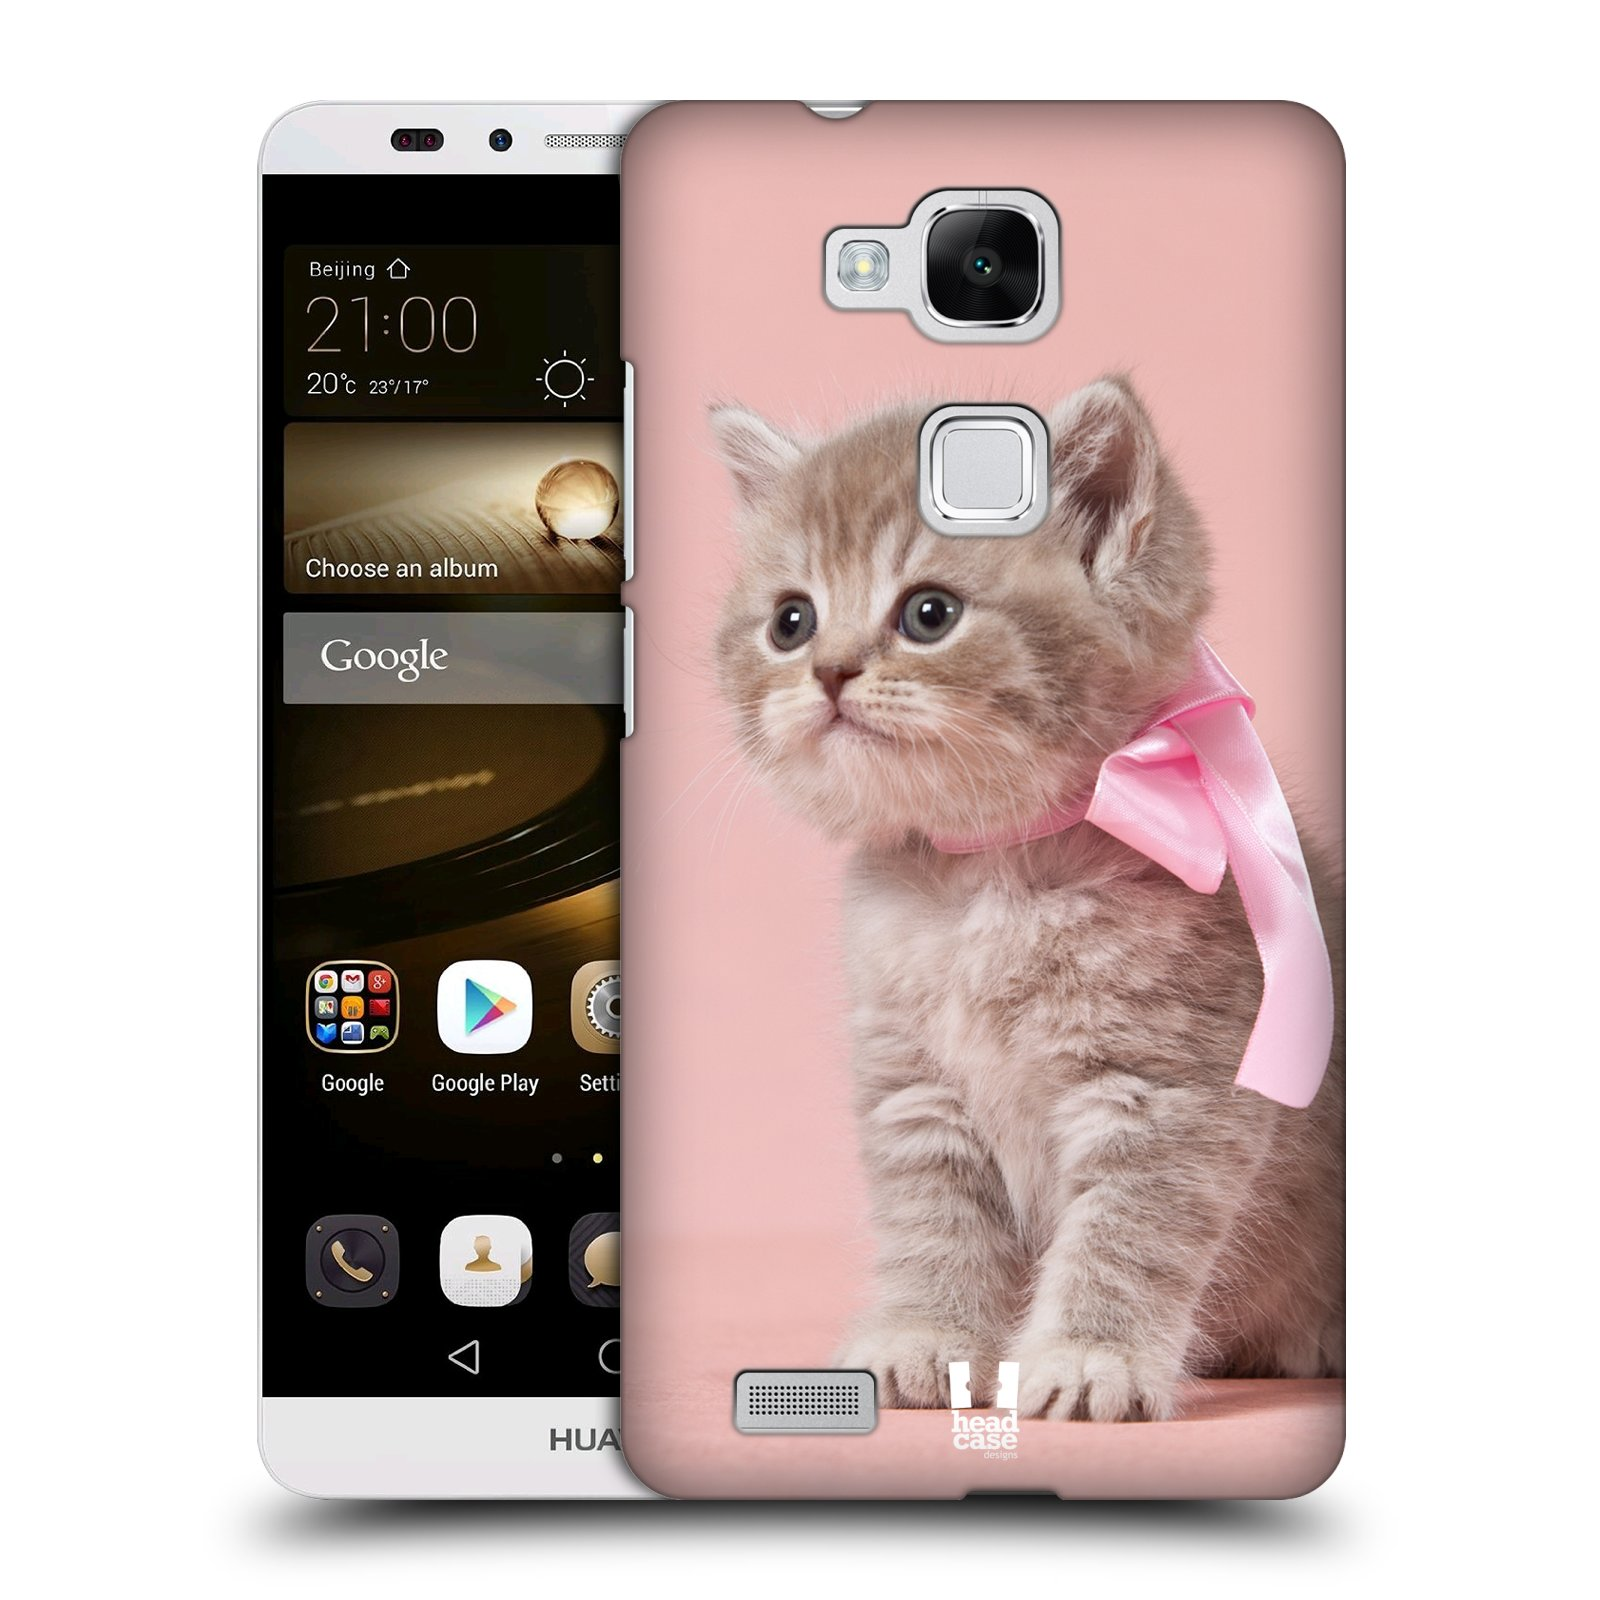 HEAD CASE plastový obal na mobil Huawei Mate 7 vzor Kočičky koťata foto kotě s růžovou mašlí